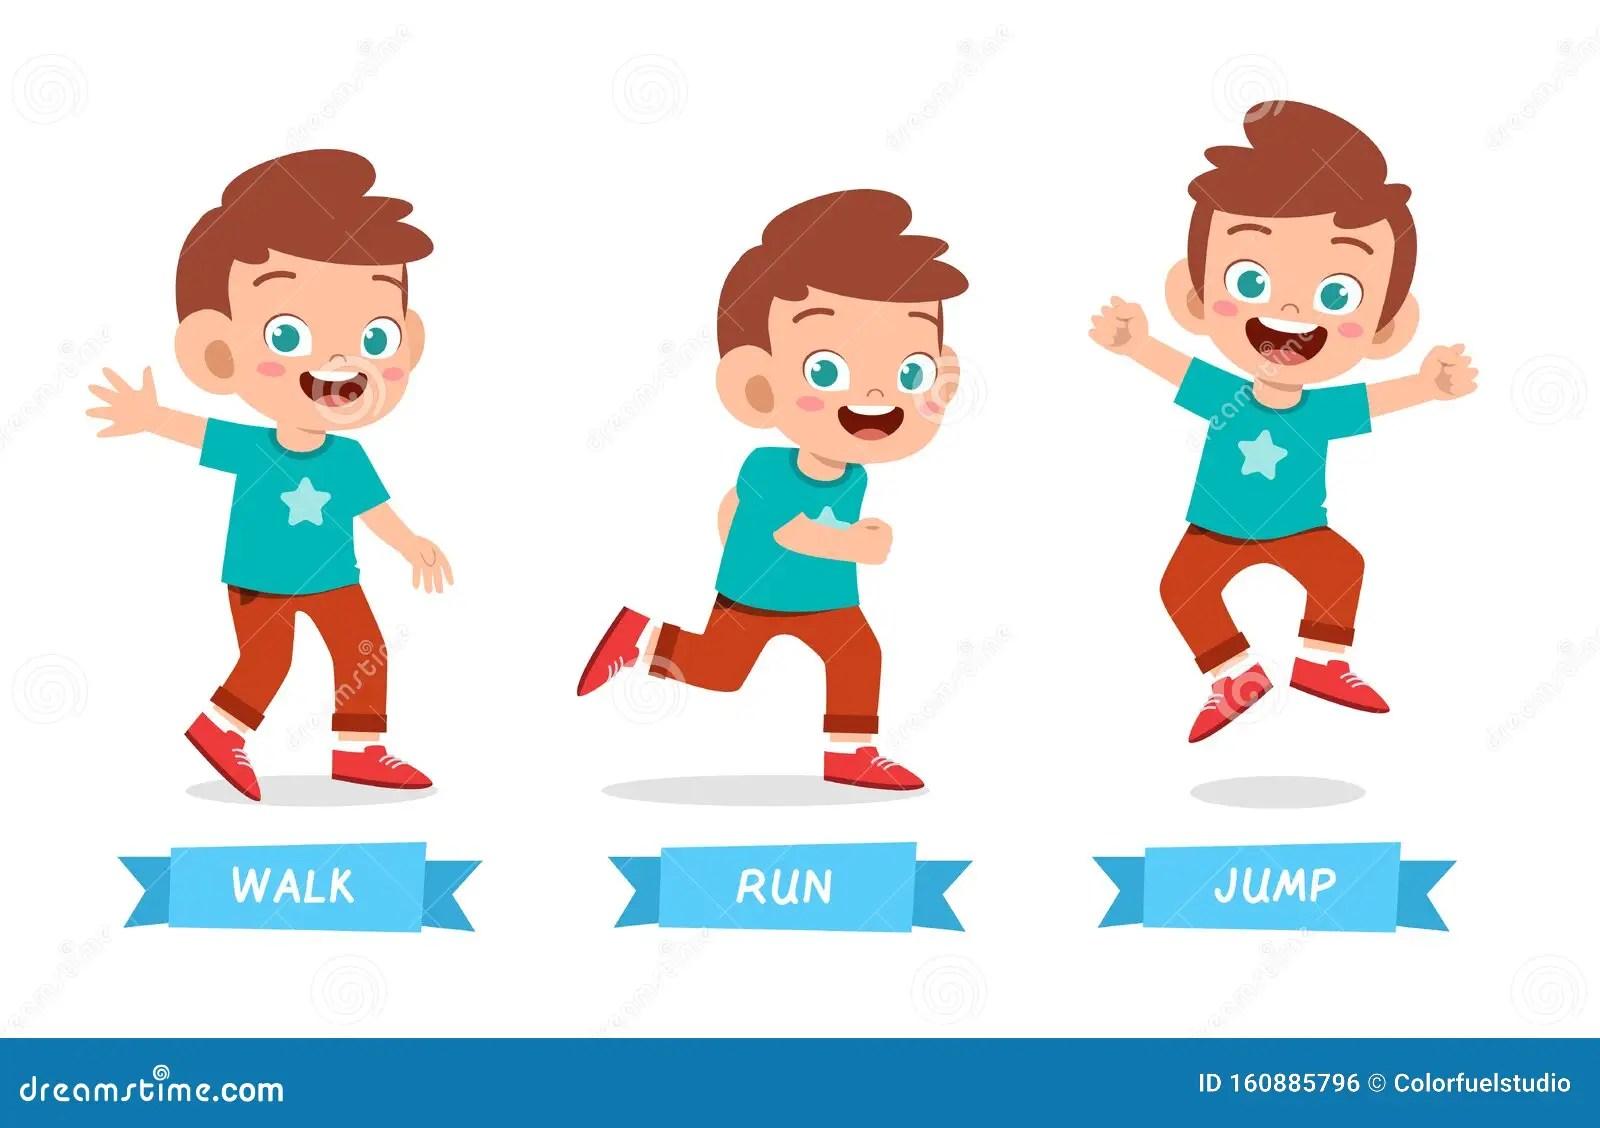 Jump Clipart Stock Illustrations 3 779 Jump Clipart